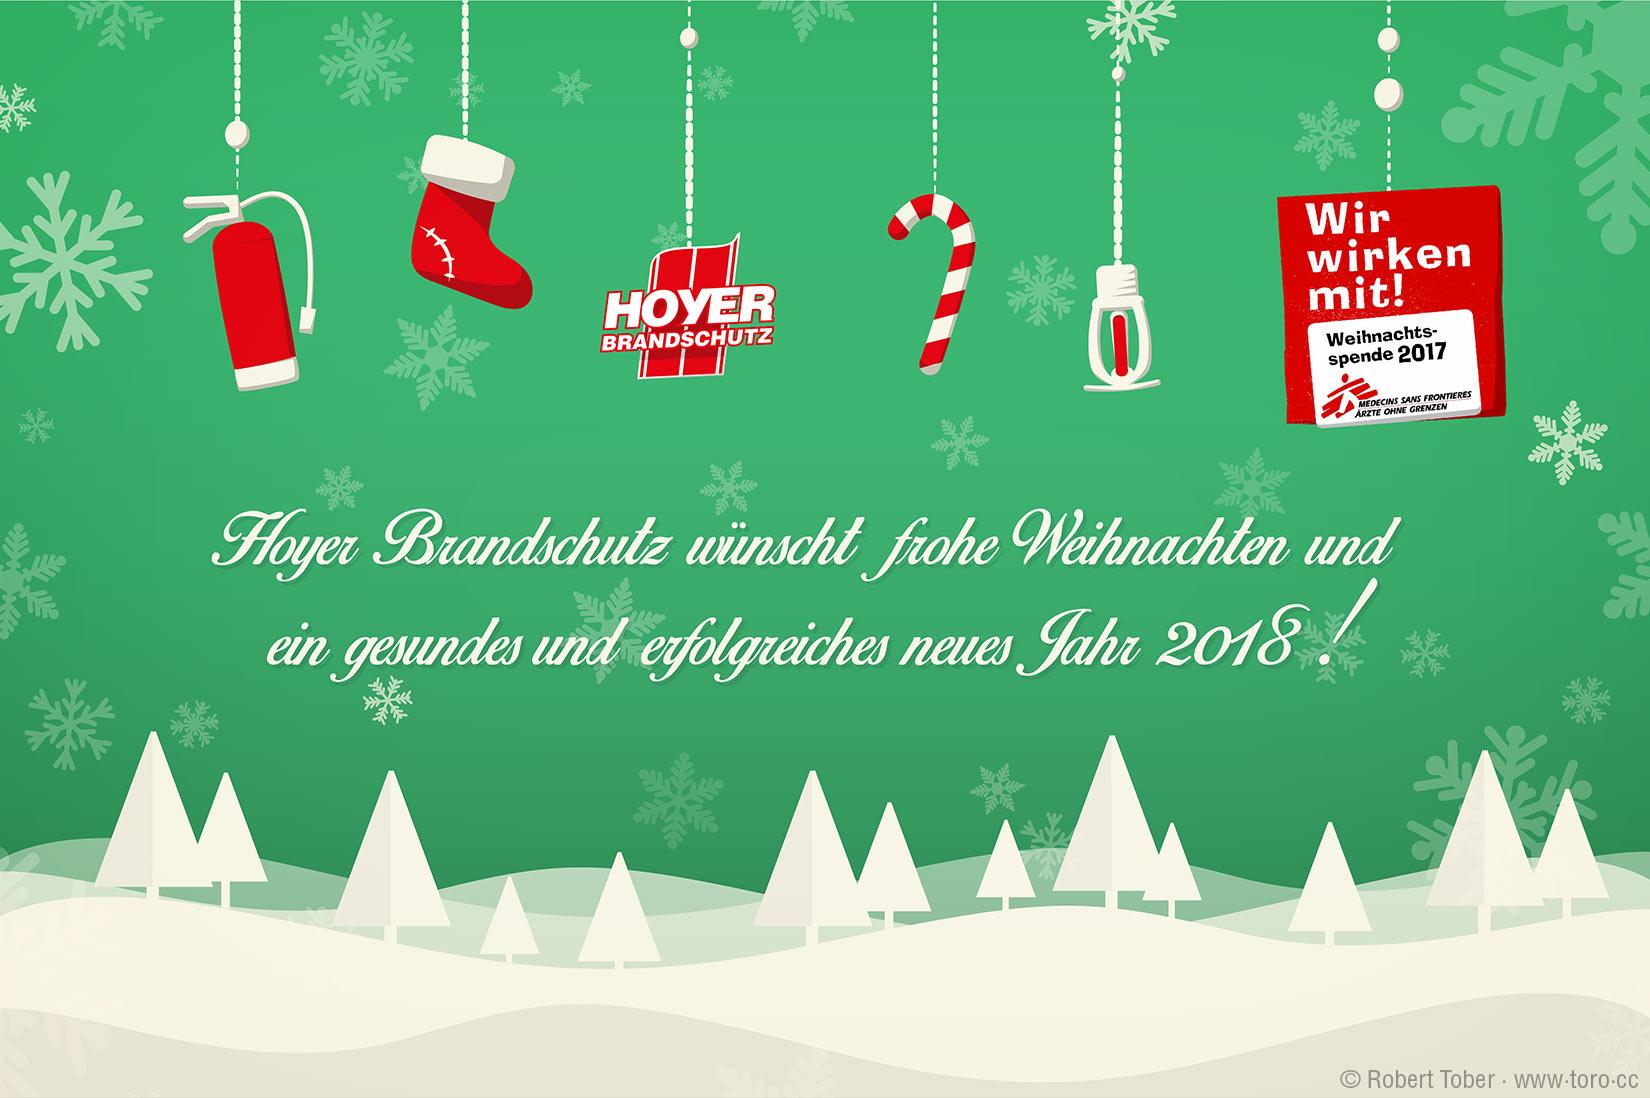 17-12-19-frohe-weihnachten-2017-wuenscht-hoyer-brandschutz-wien-robert-tober-illustration